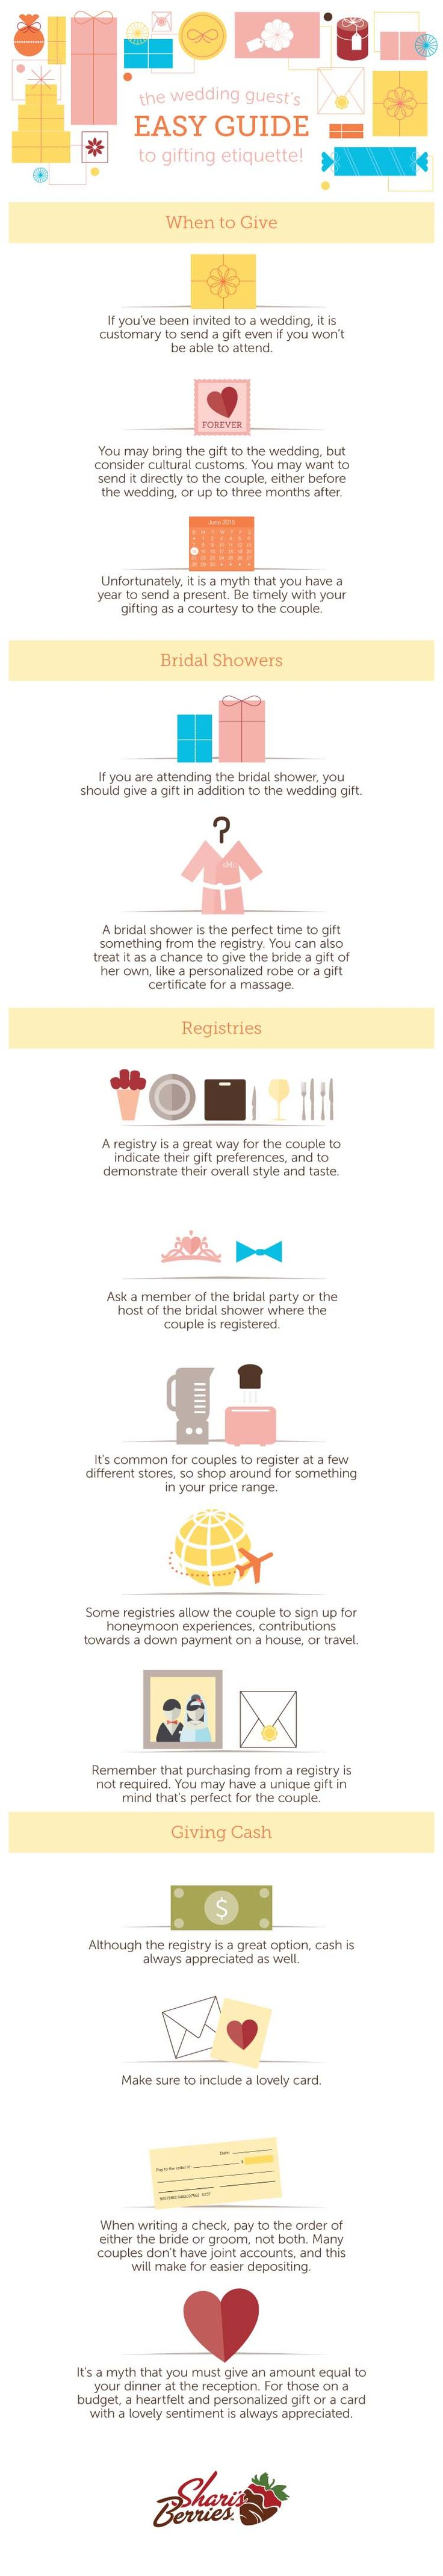 77 best Celebrate Weddings images on Pinterest | Wedding ideas ...